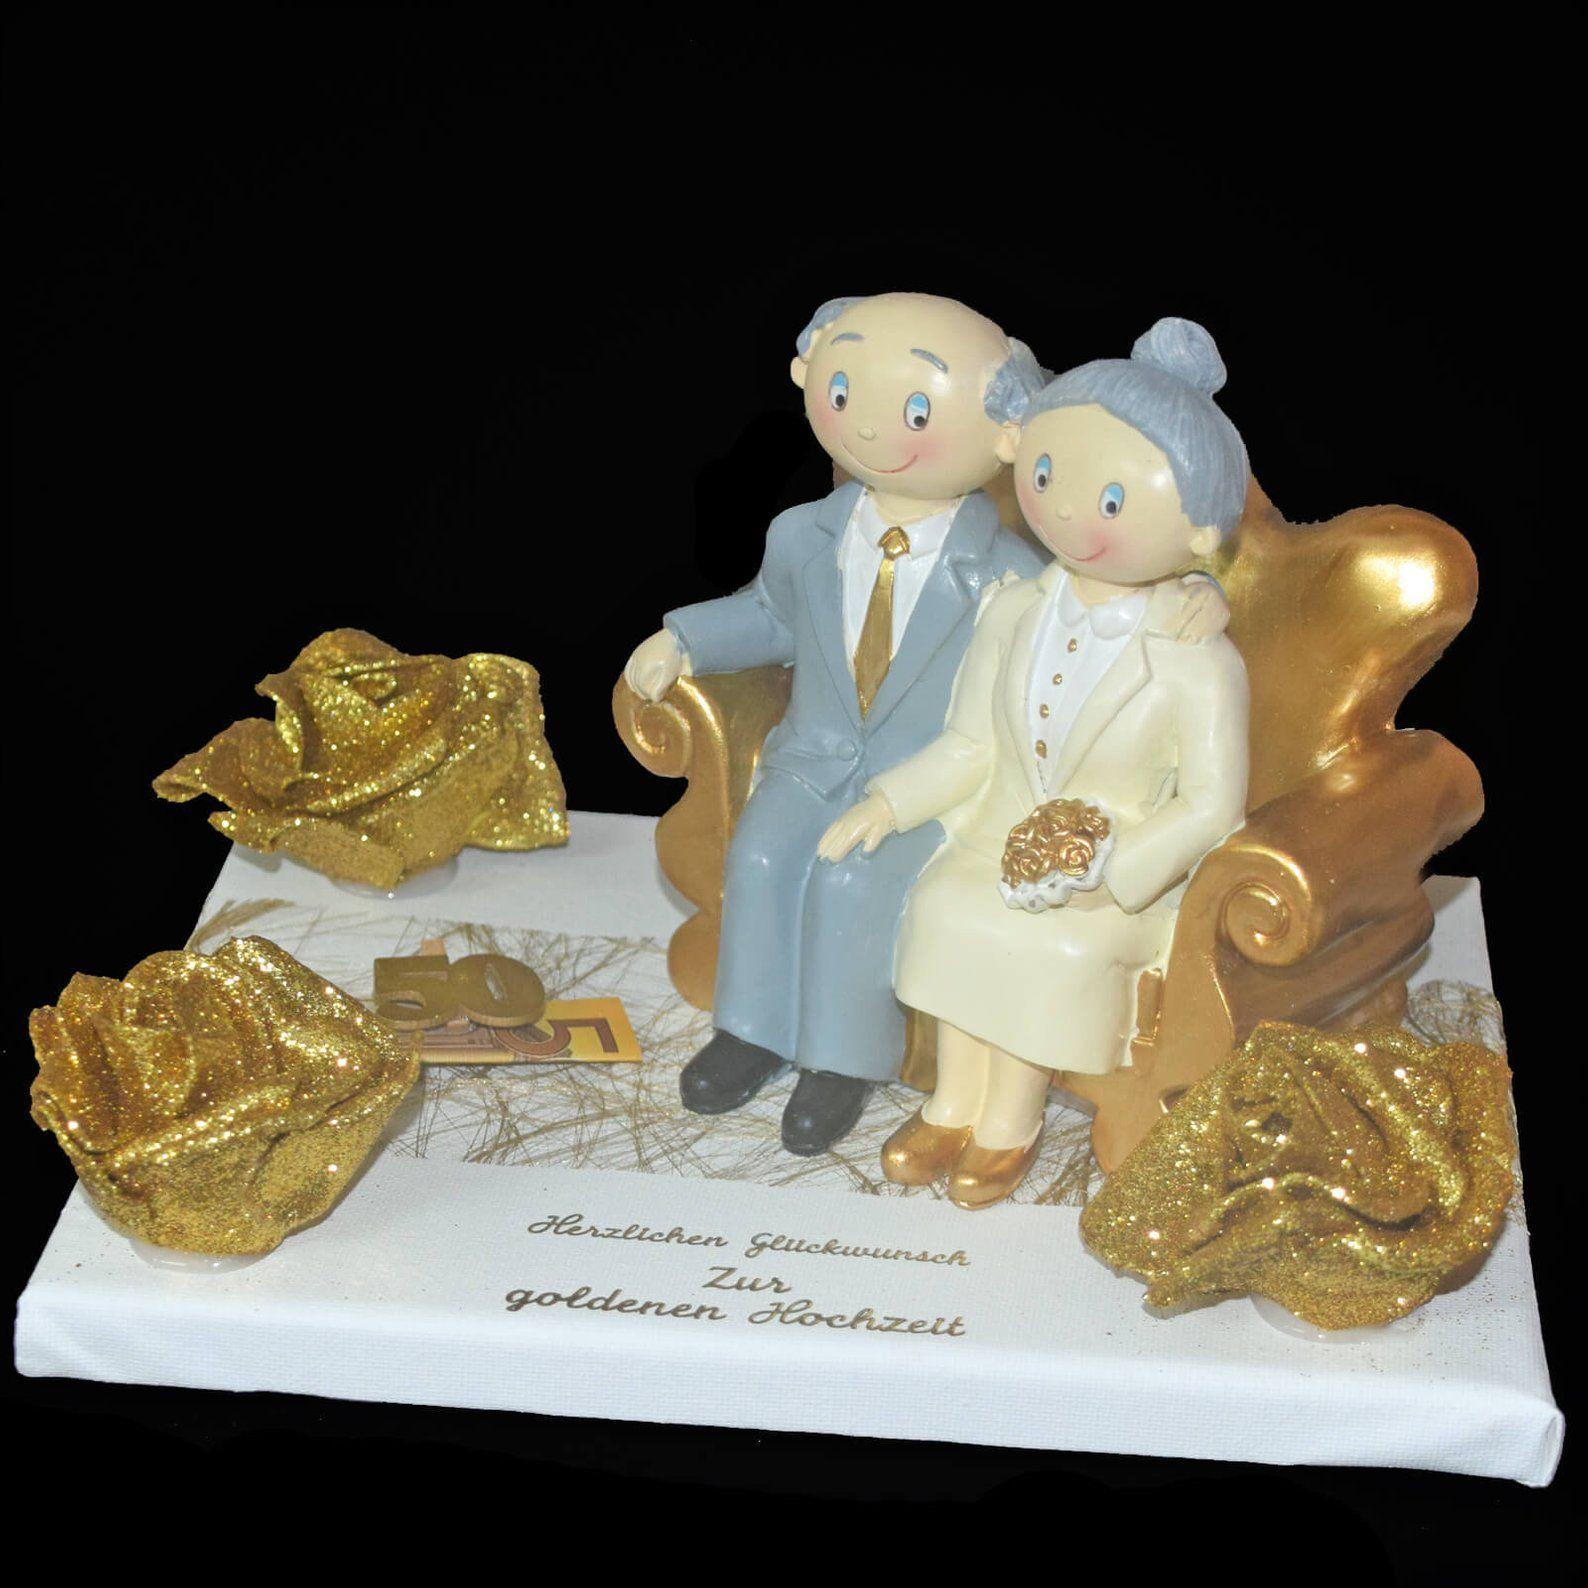 Gift To The Golden Wedding Gold Pair On Gift Plate Deko